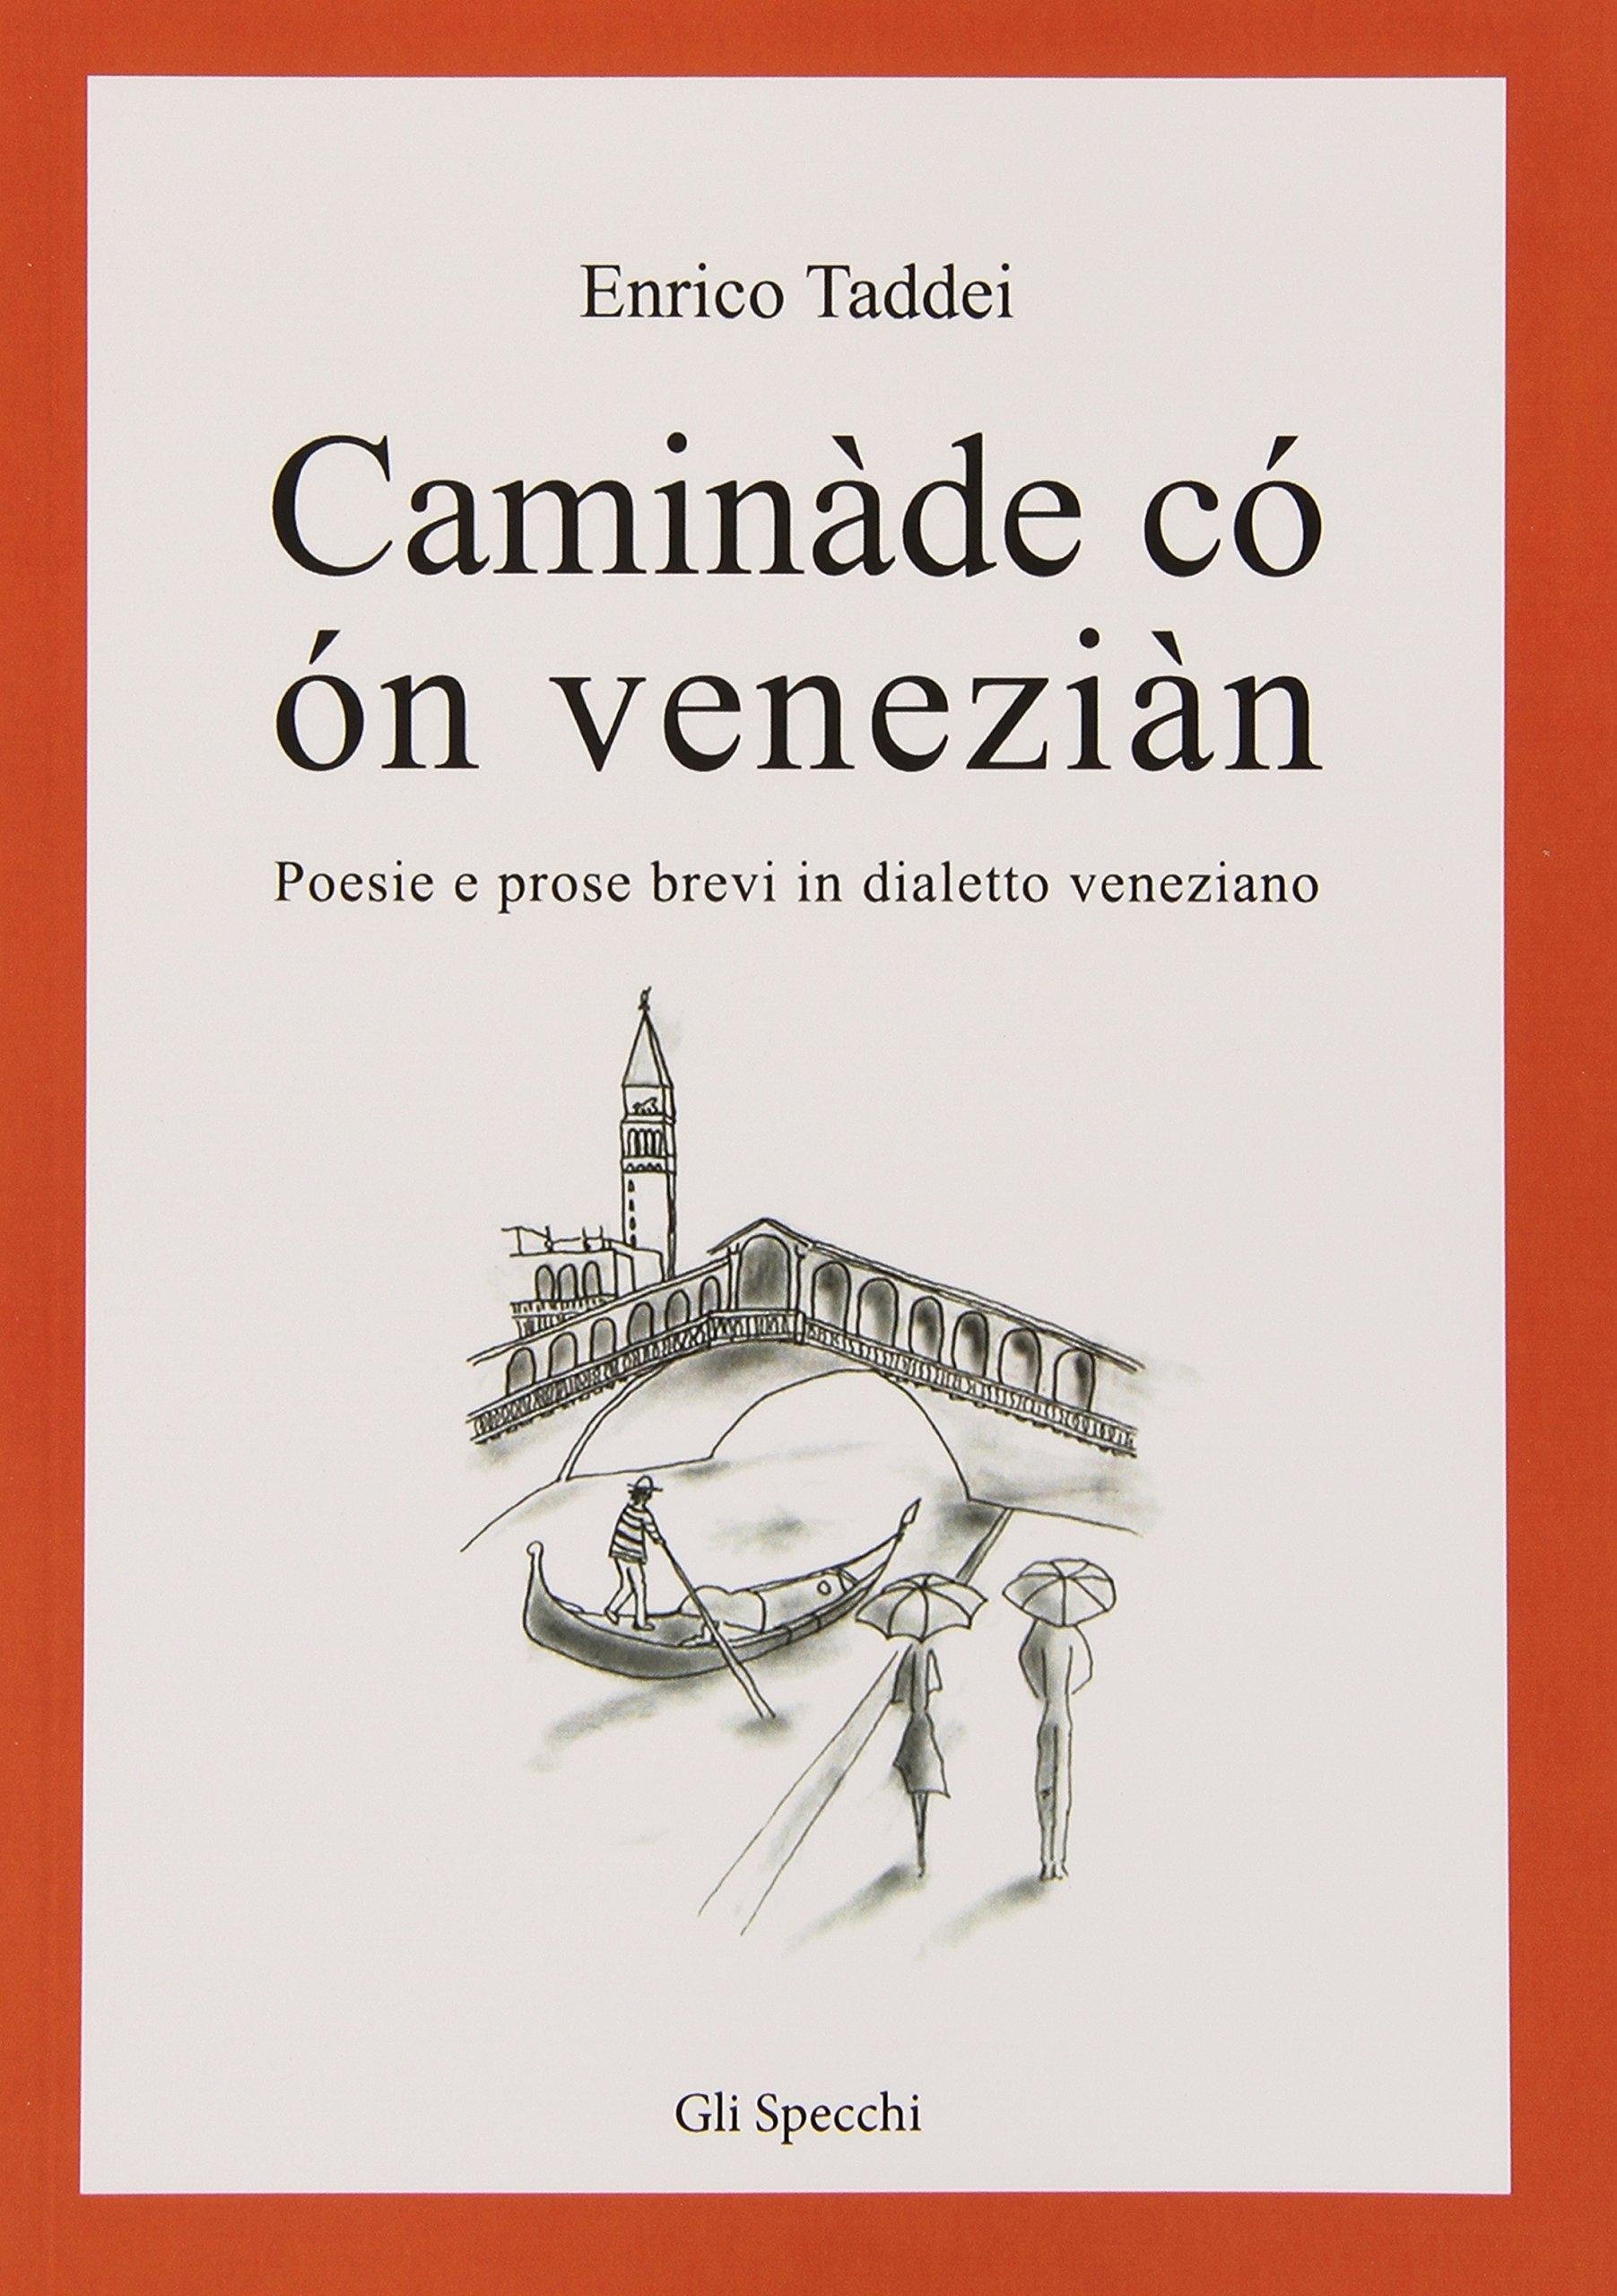 Caminàde có ón veneziàn. Poesie e prose brevi in dialetto veneziano